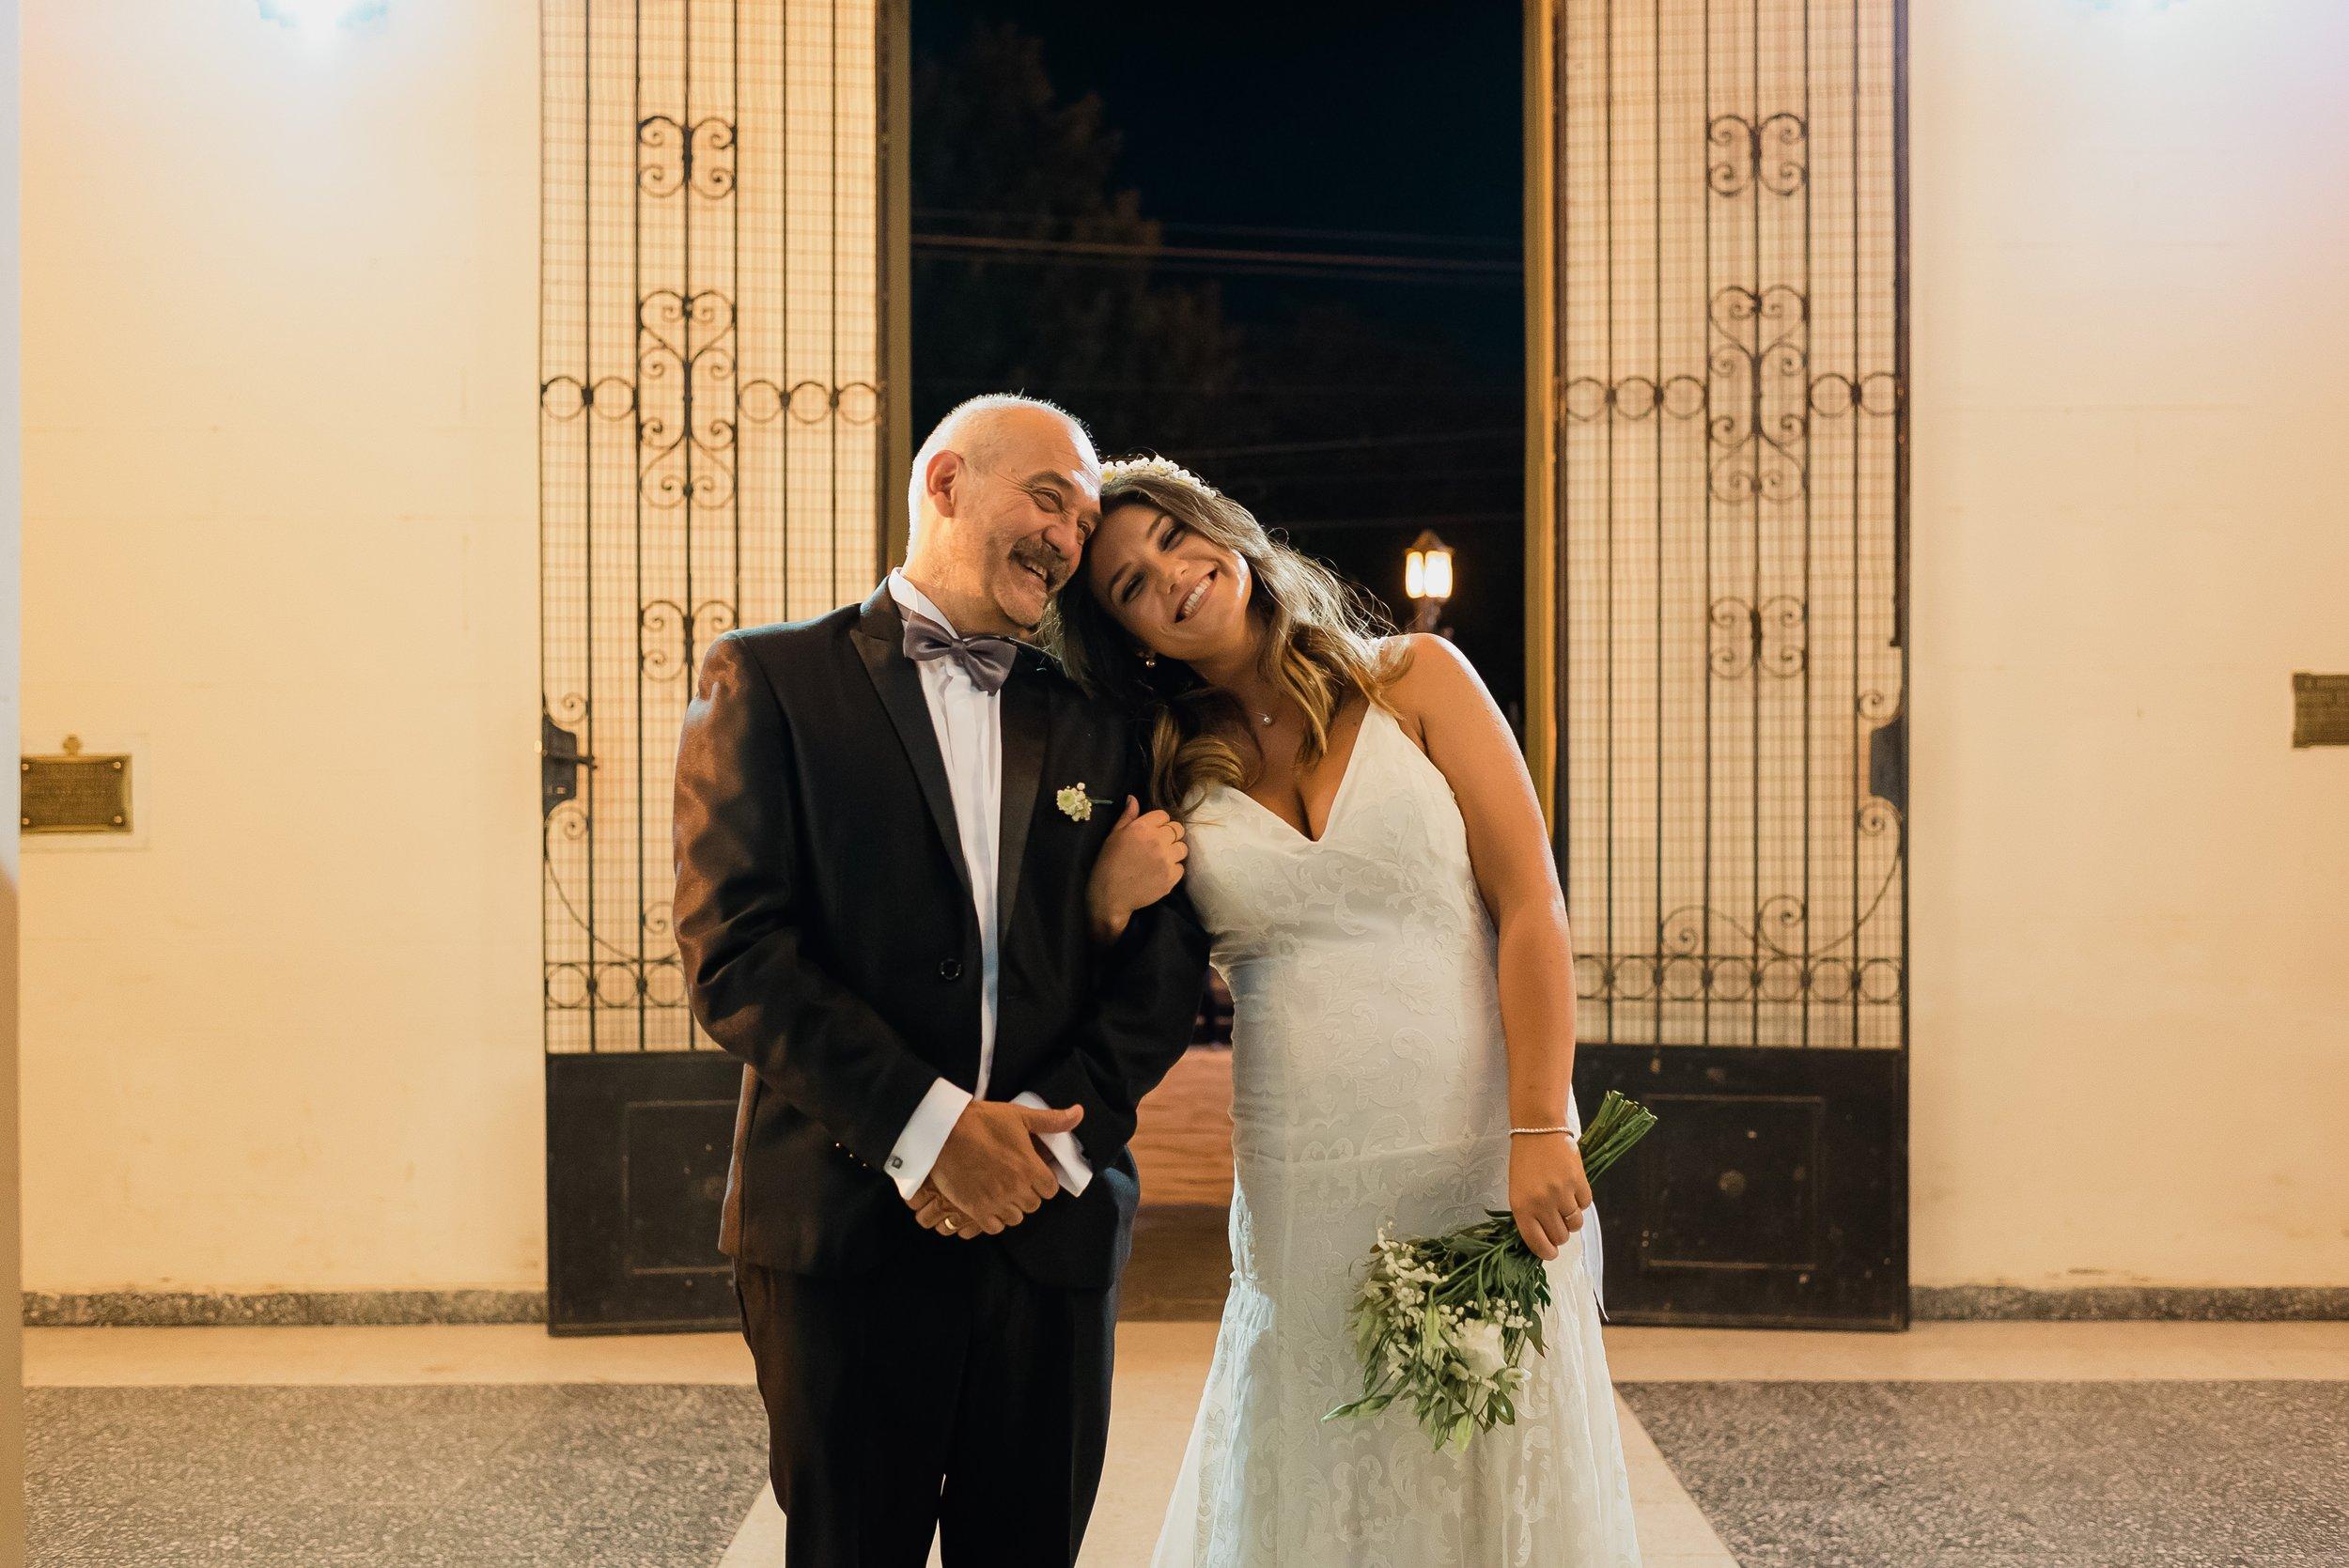 Casamiento en cordoba 25.JPG